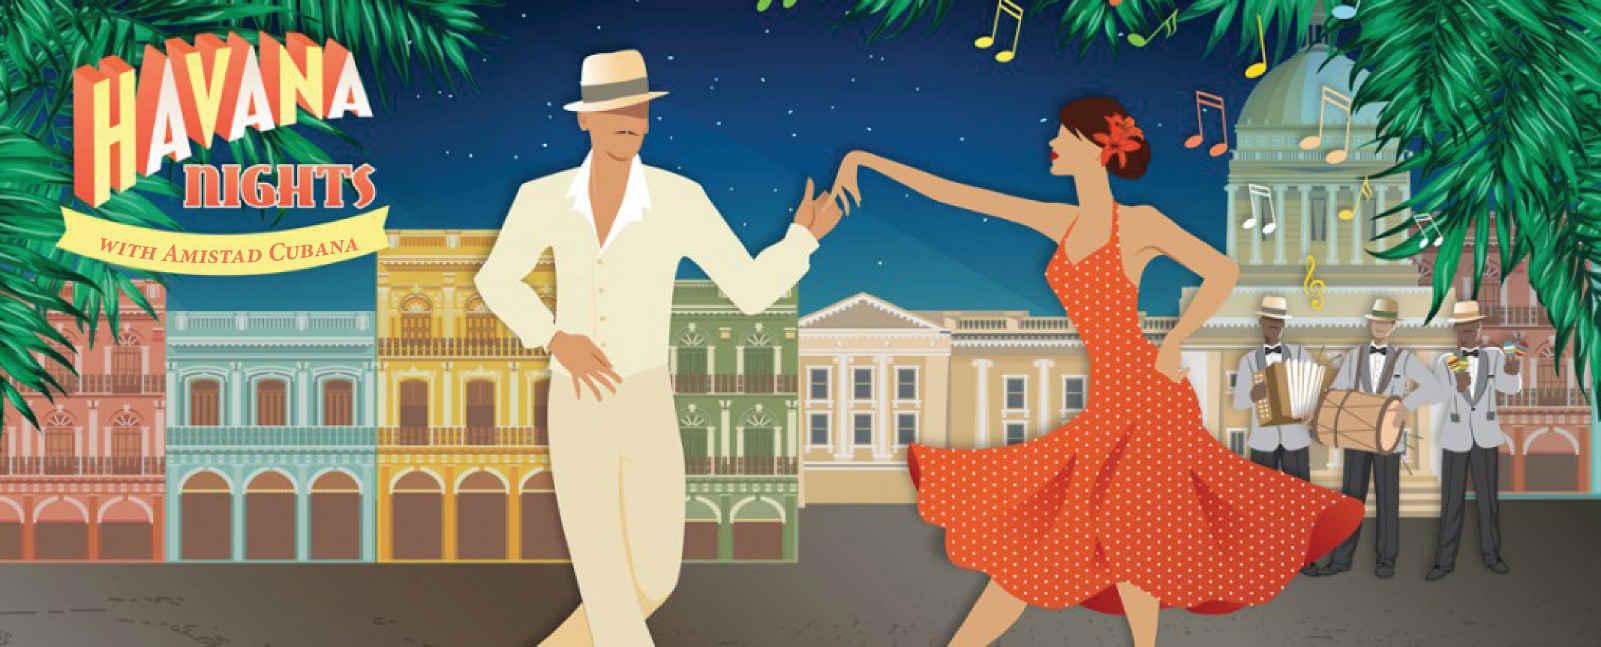 Havana Nights image